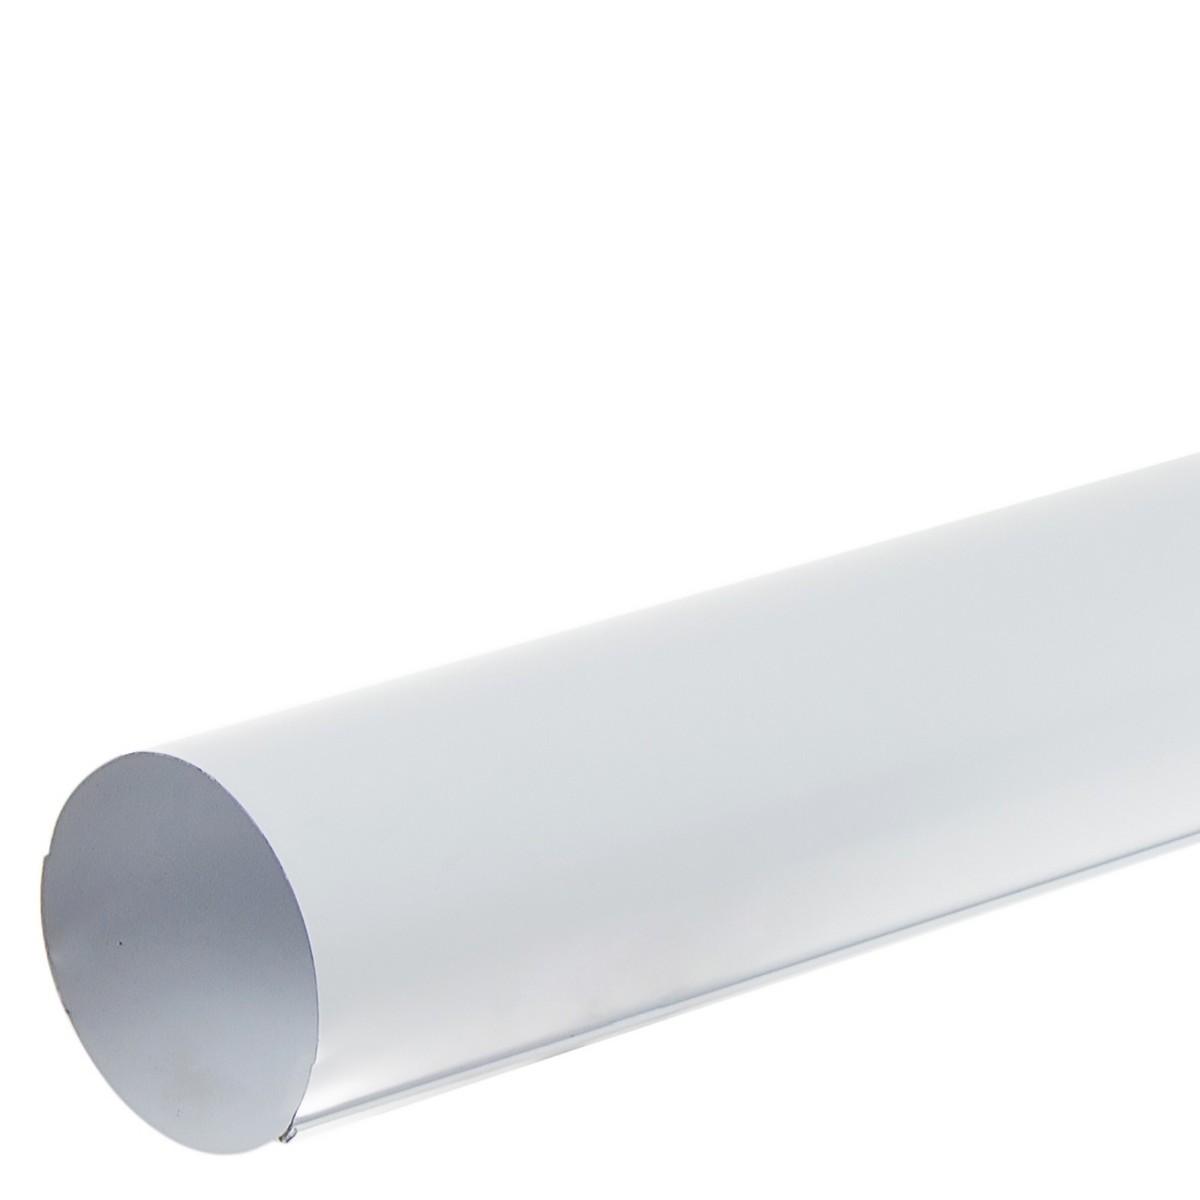 Труба водосточная 2000х90 мм цвет белый